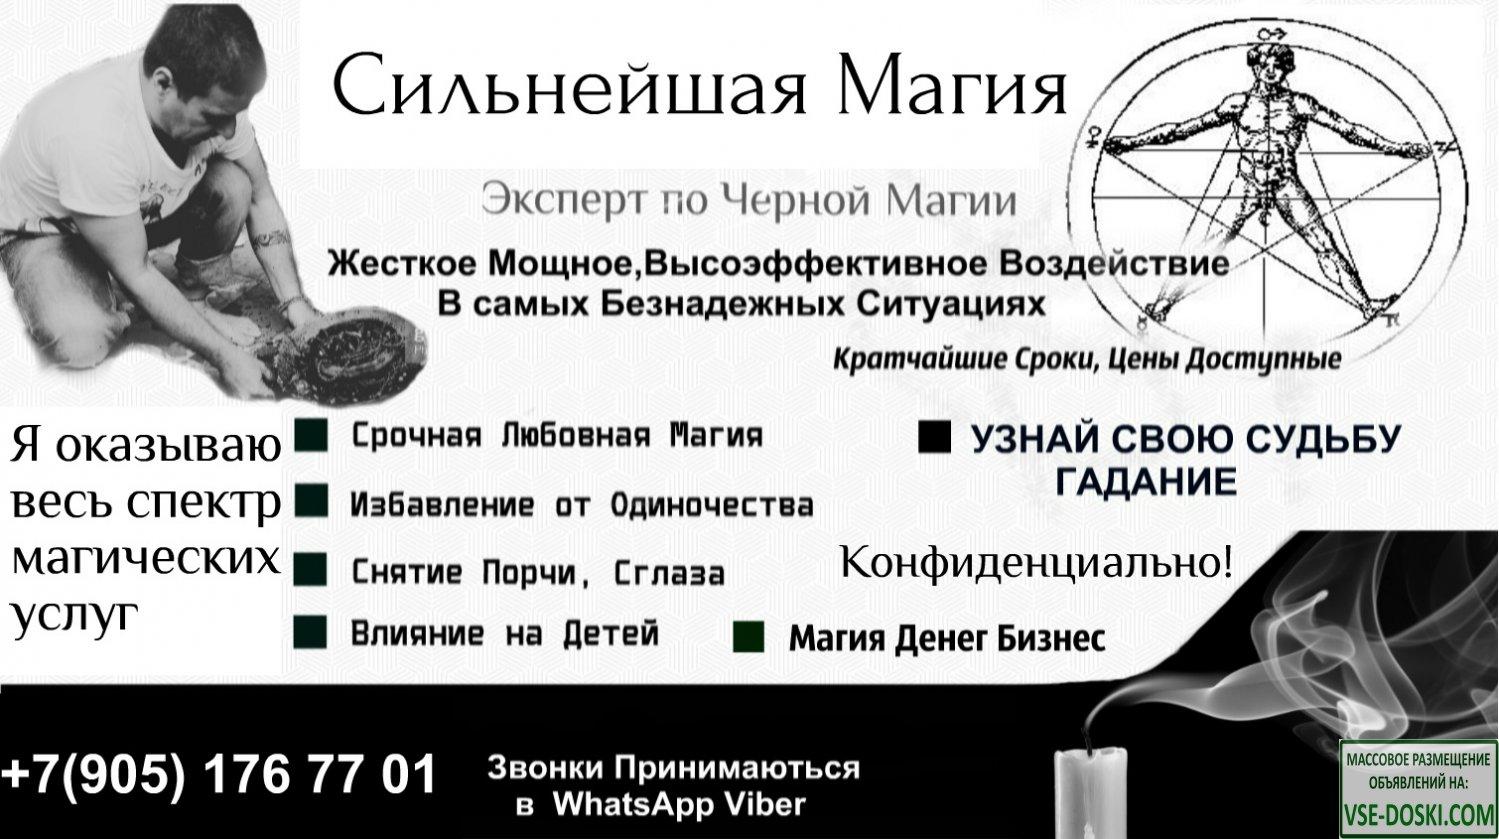 Маг и Магические Услуги в Омске.Приворот-Отворот